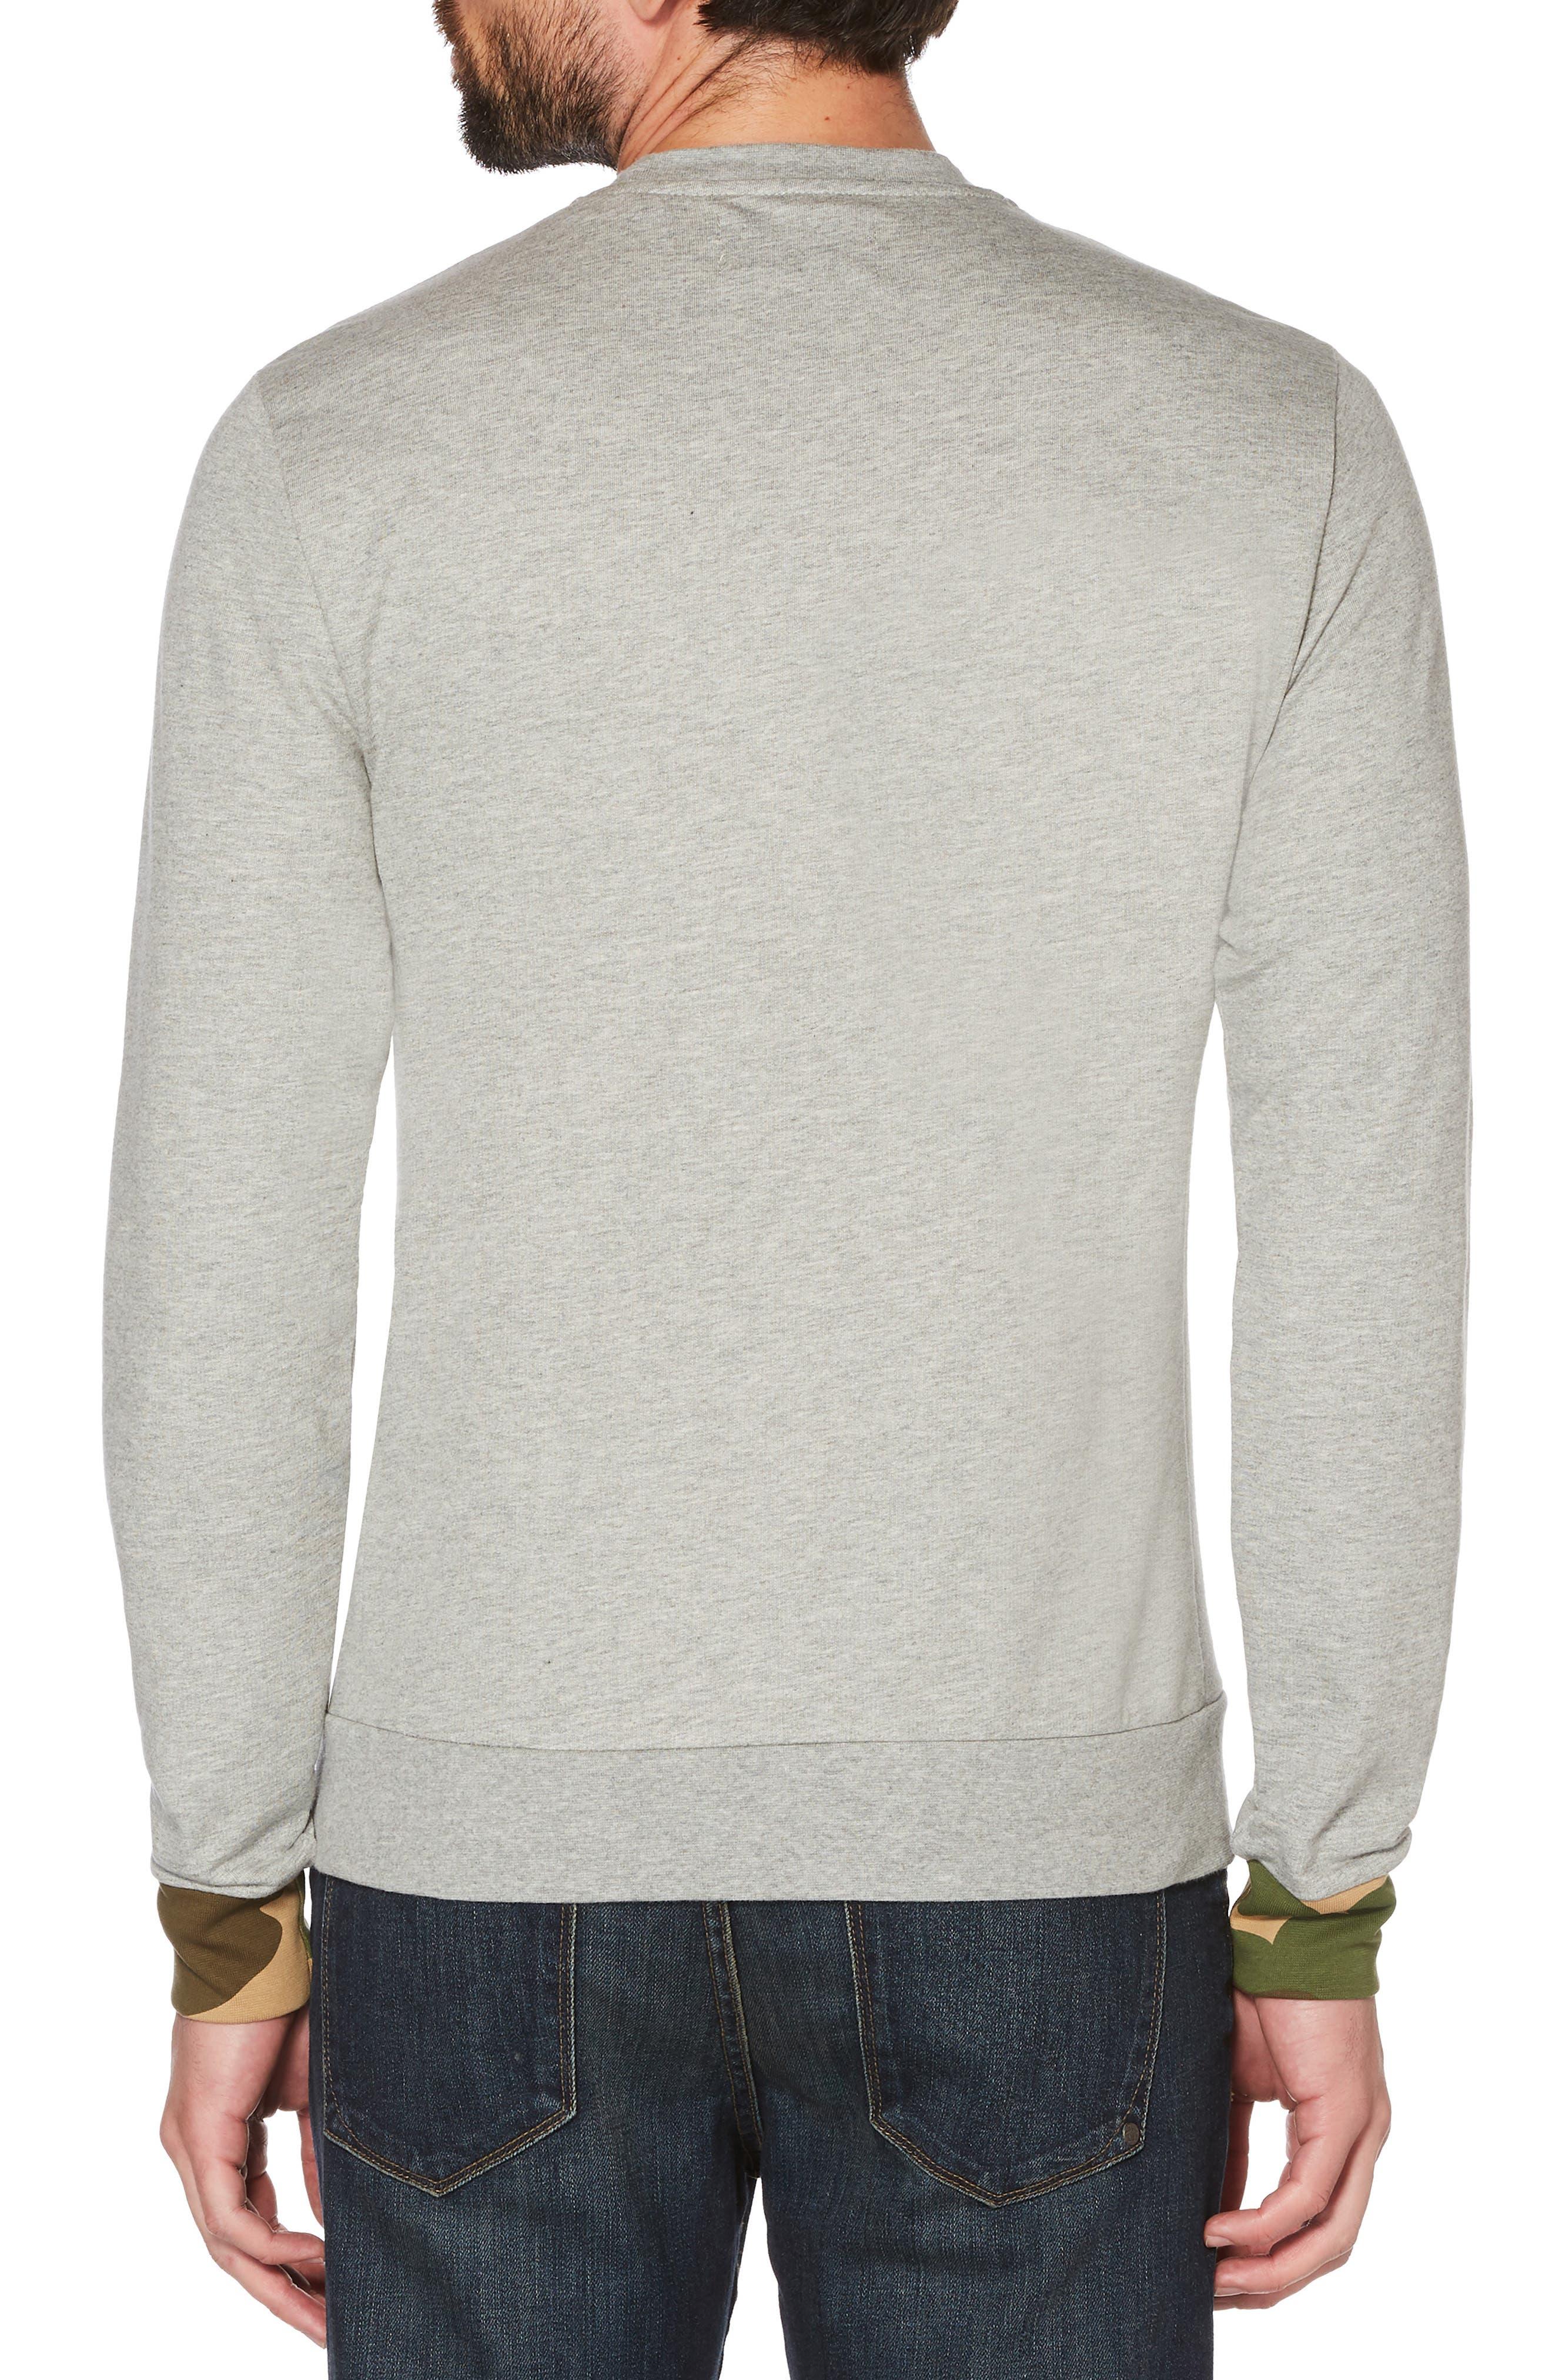 Camo Cuff Sweatshirt,                             Alternate thumbnail 2, color,                             080